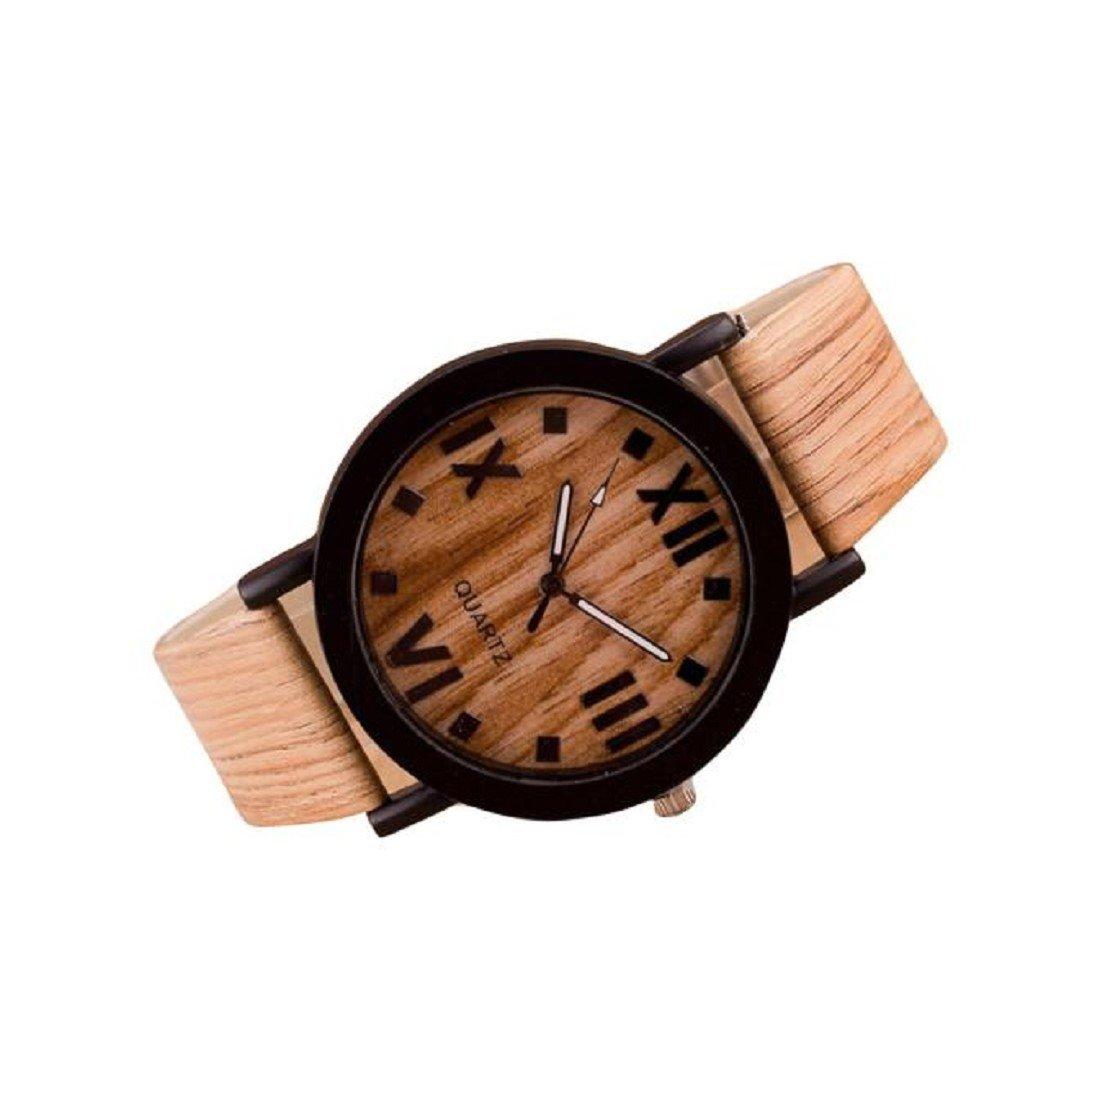 Hemlock Retro Roman Numerals Quartz Wrist Watches Wood Analog PU Leather Band Watches Light Brown